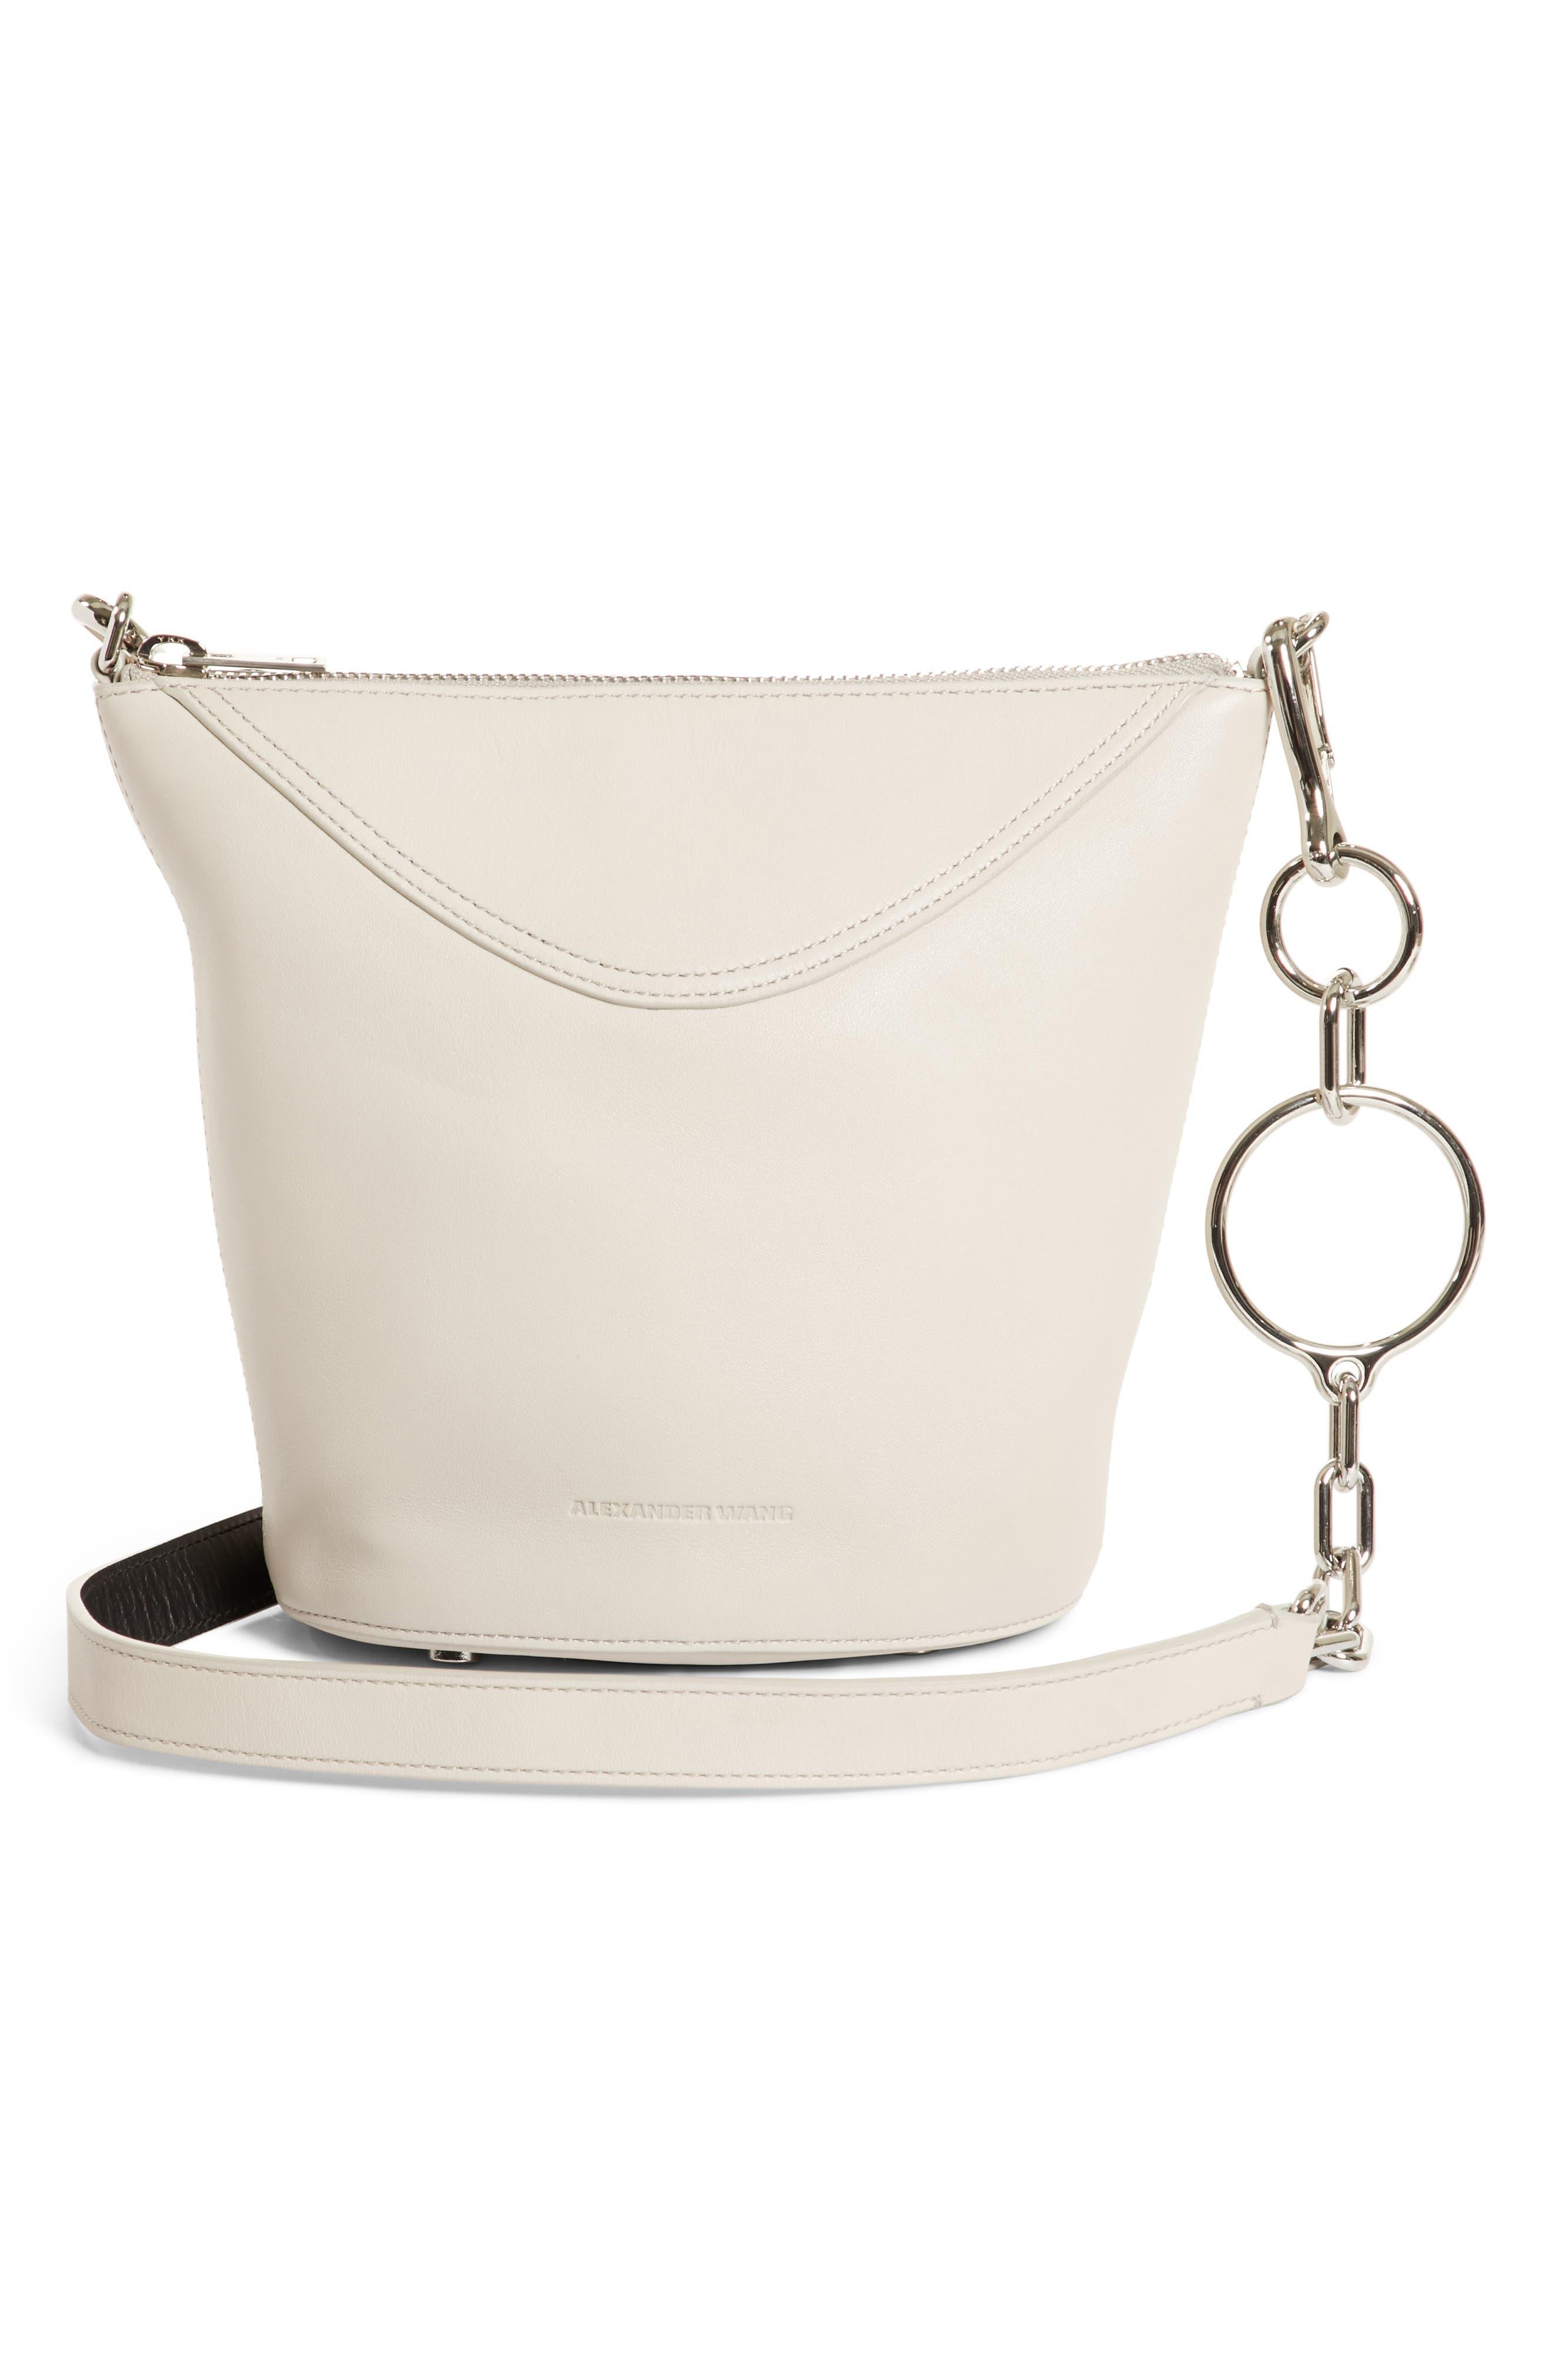 Ace Leather Bucket Bag,                             Alternate thumbnail 3, color,                             021